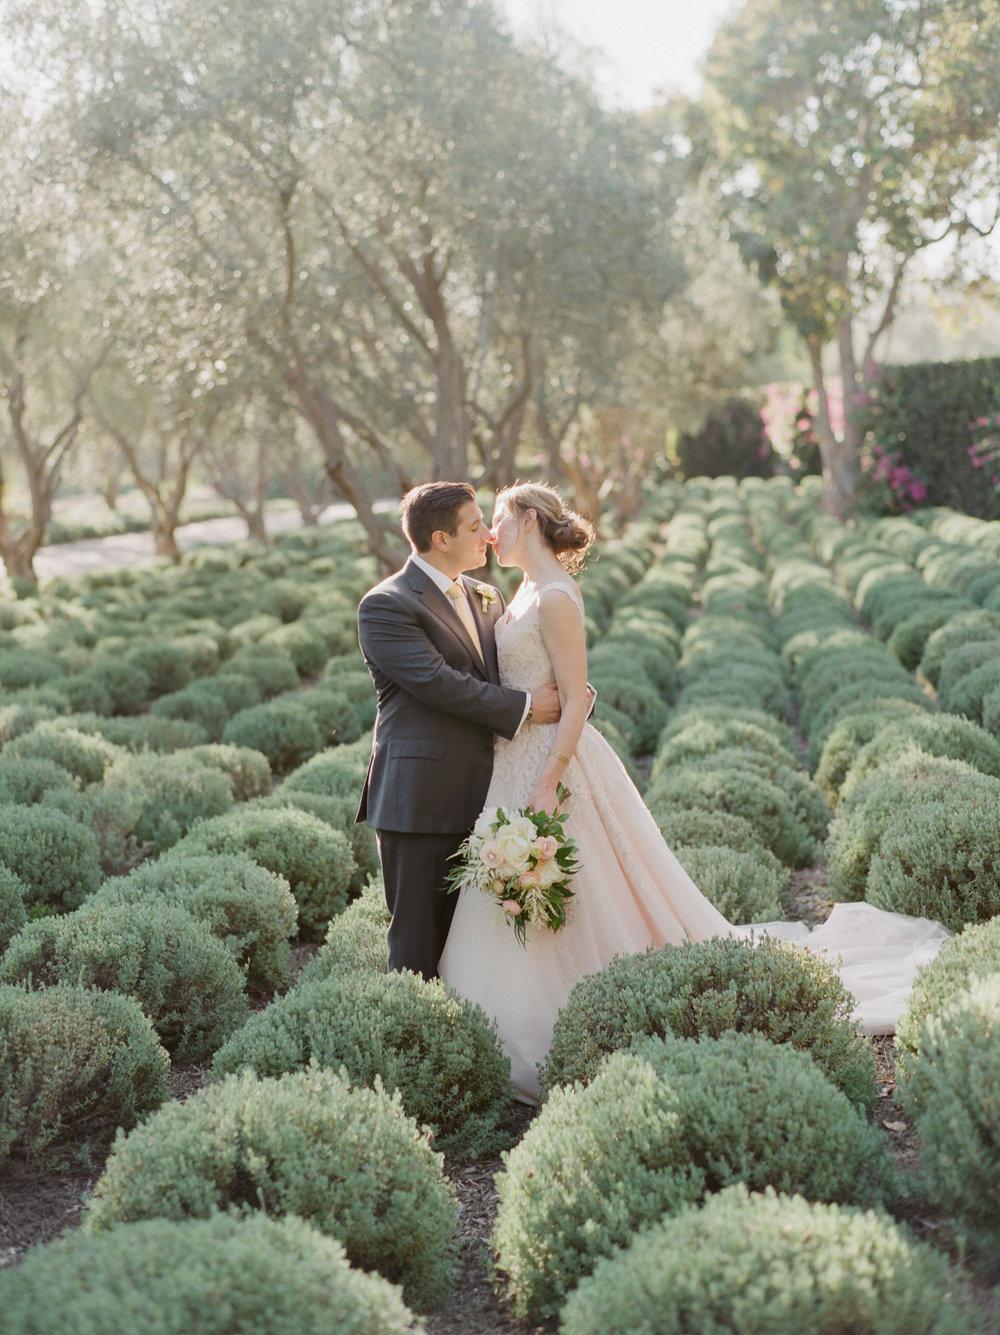 Jessica&Chris_GettingReady_san_ysidro_ranch_wedding_Magnolia_Event_Design_blush_212.jpg